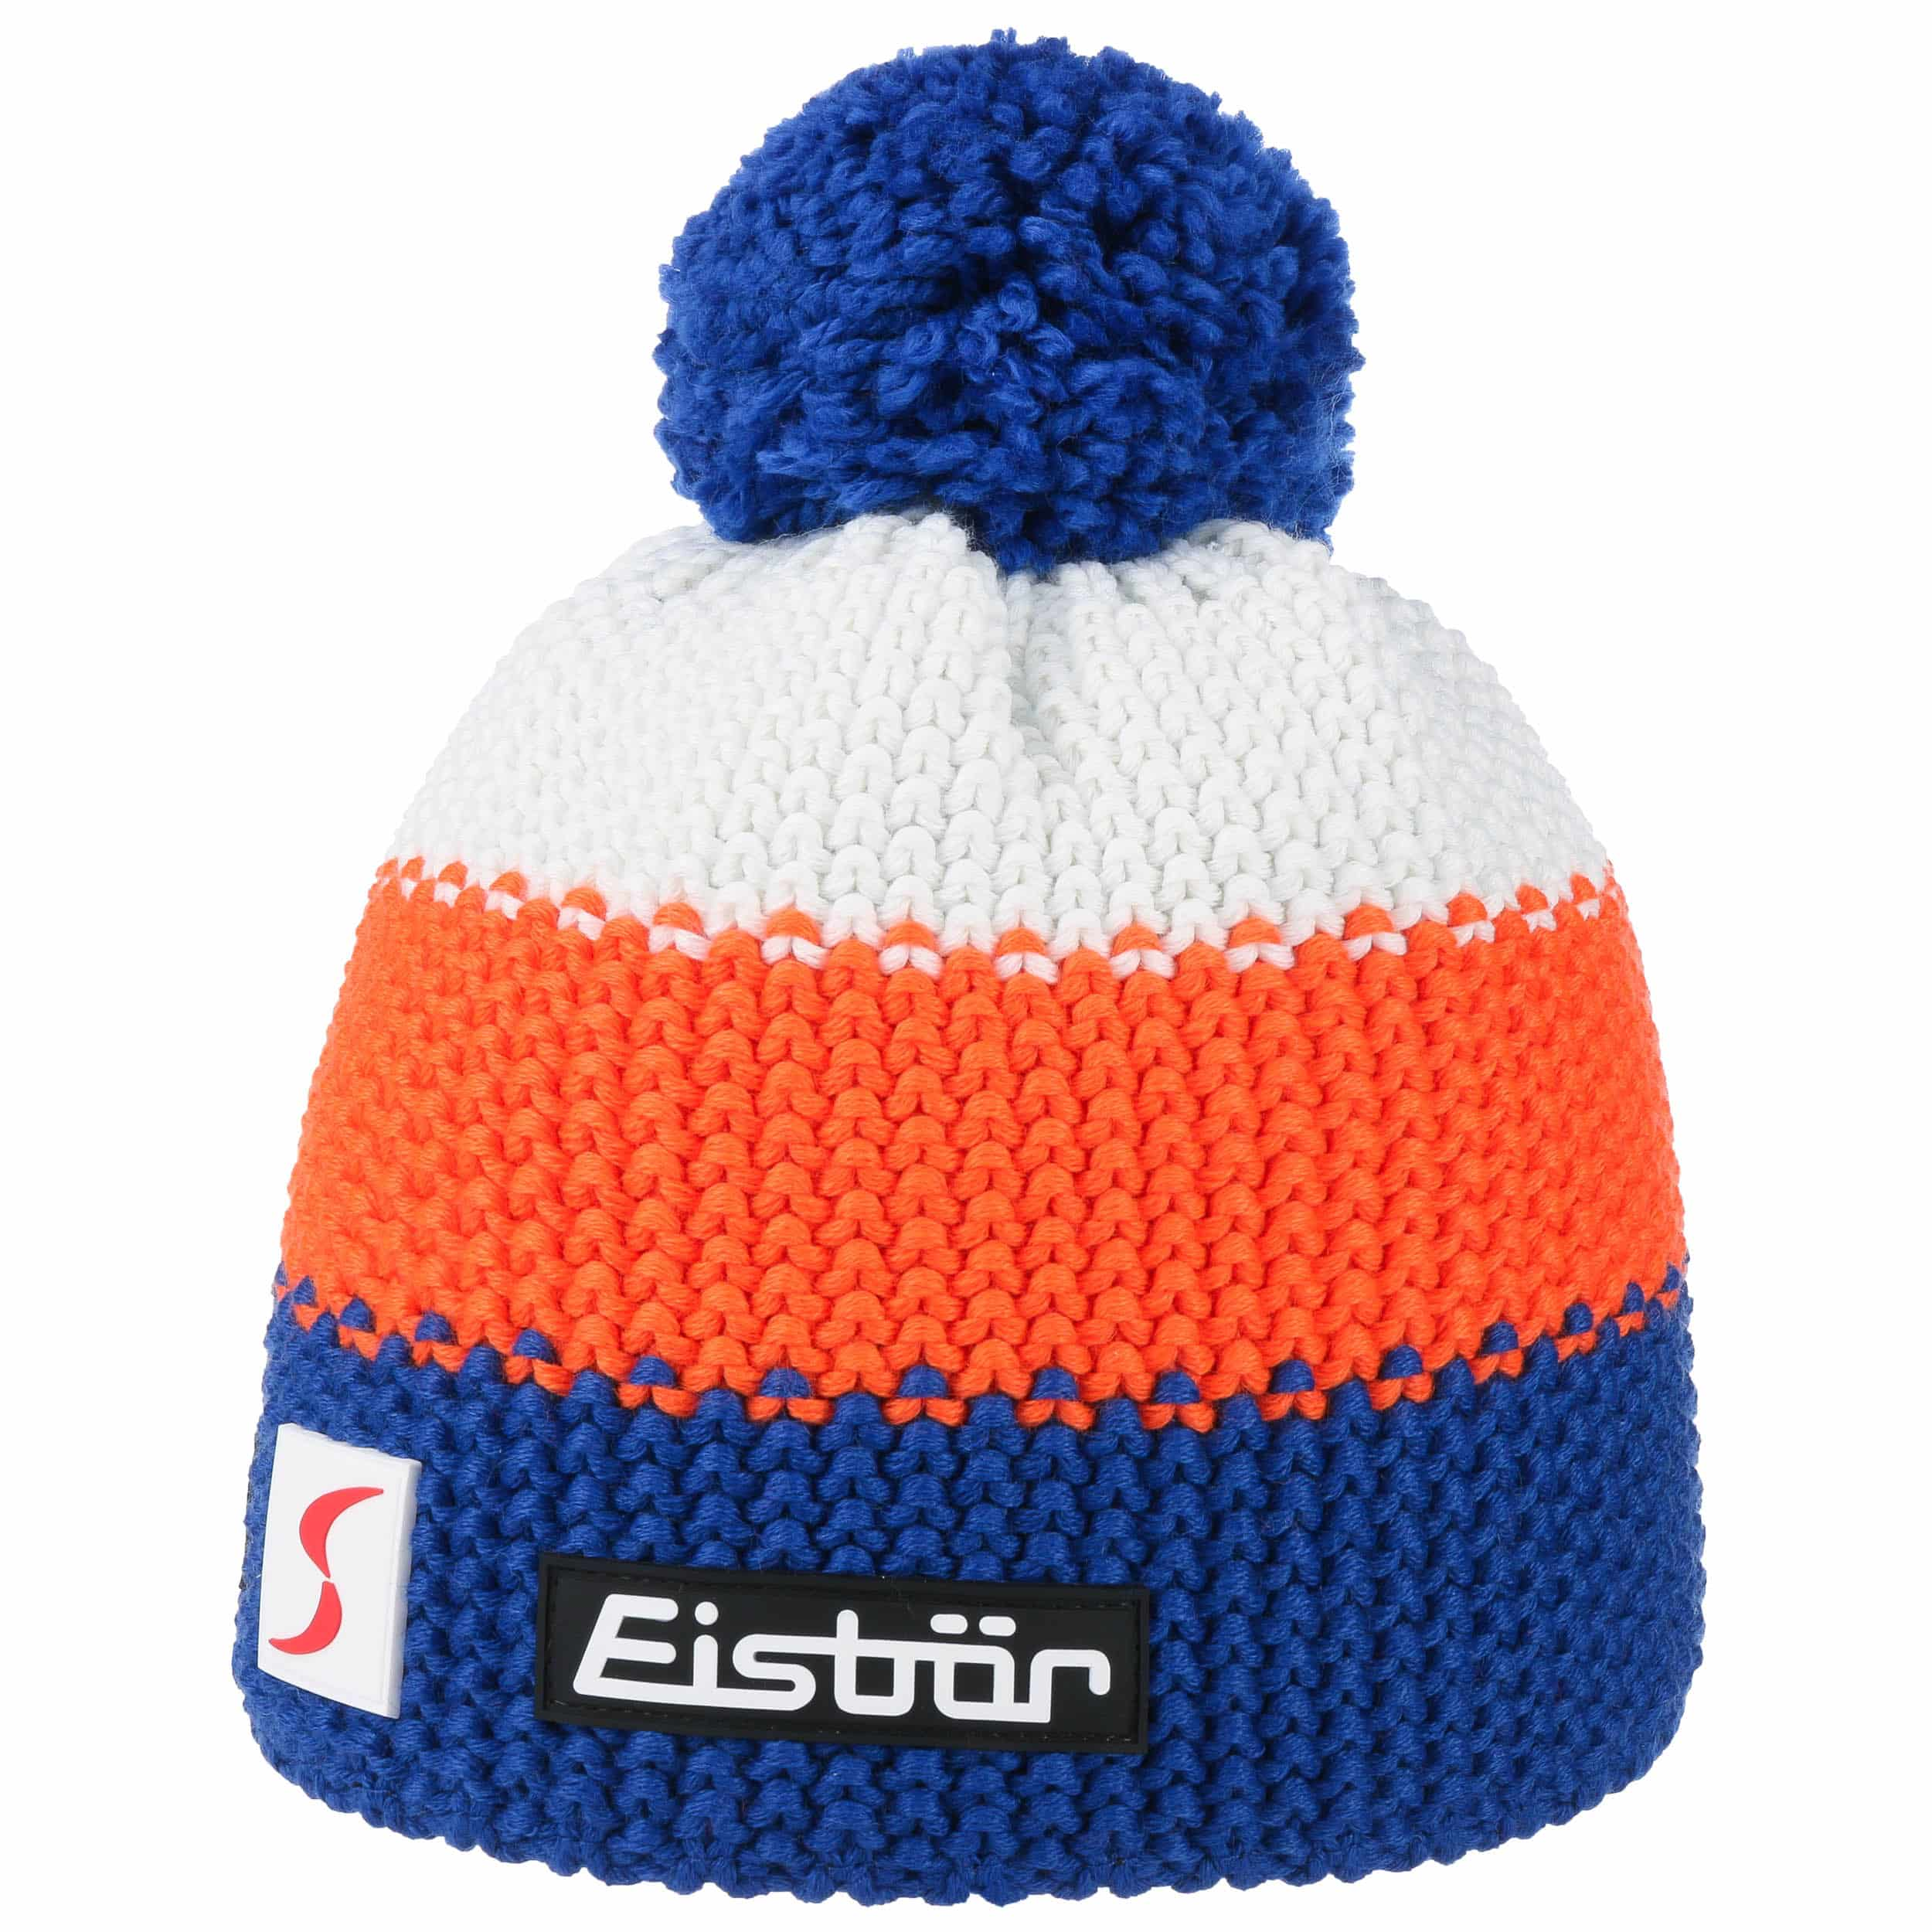 ... Star Neon Bobble Hat by Eisbär - royal-blue 3 e2022331fc22